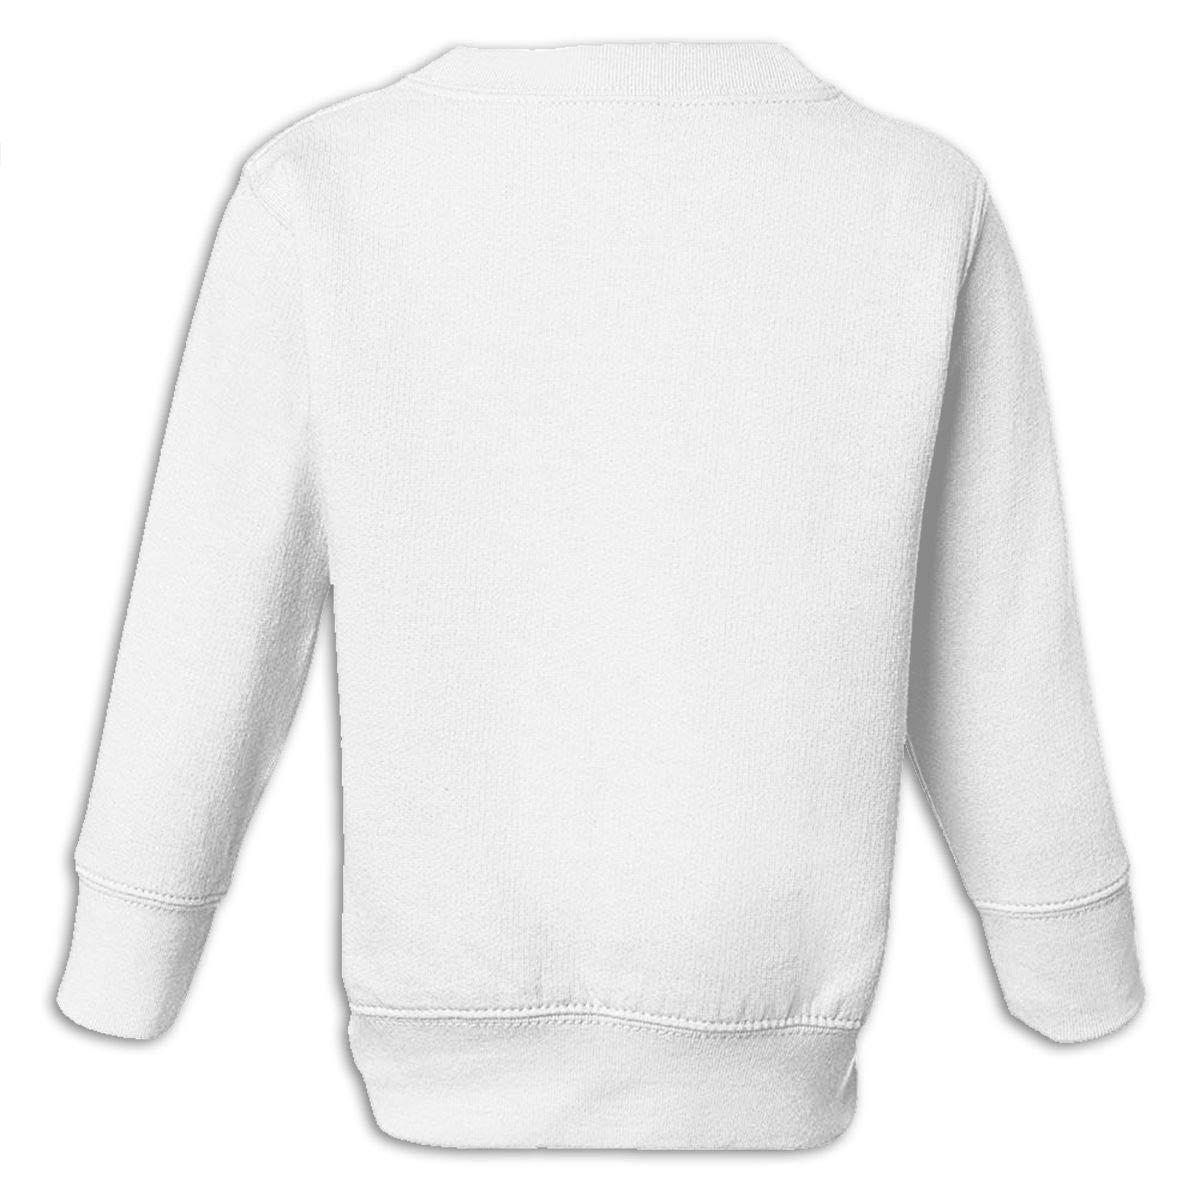 Fleece Pull Over Sweatshirt for Boys Girls Kids Youth Dog-1 Unisex Toddler Hoodies